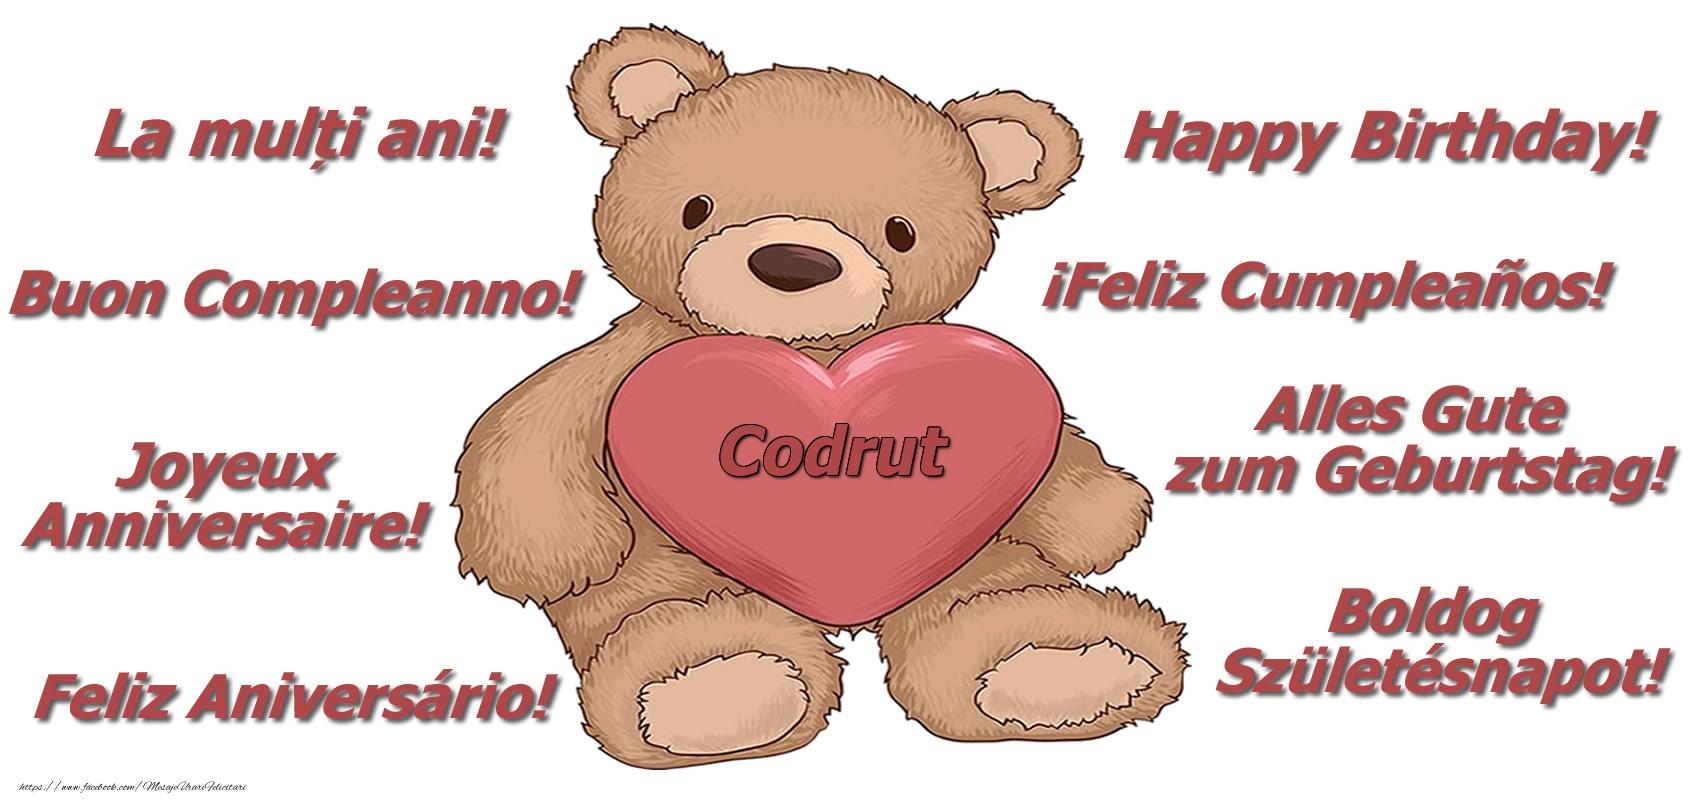 Felicitari de zi de nastere - La multi ani Codrut! - Ursulet